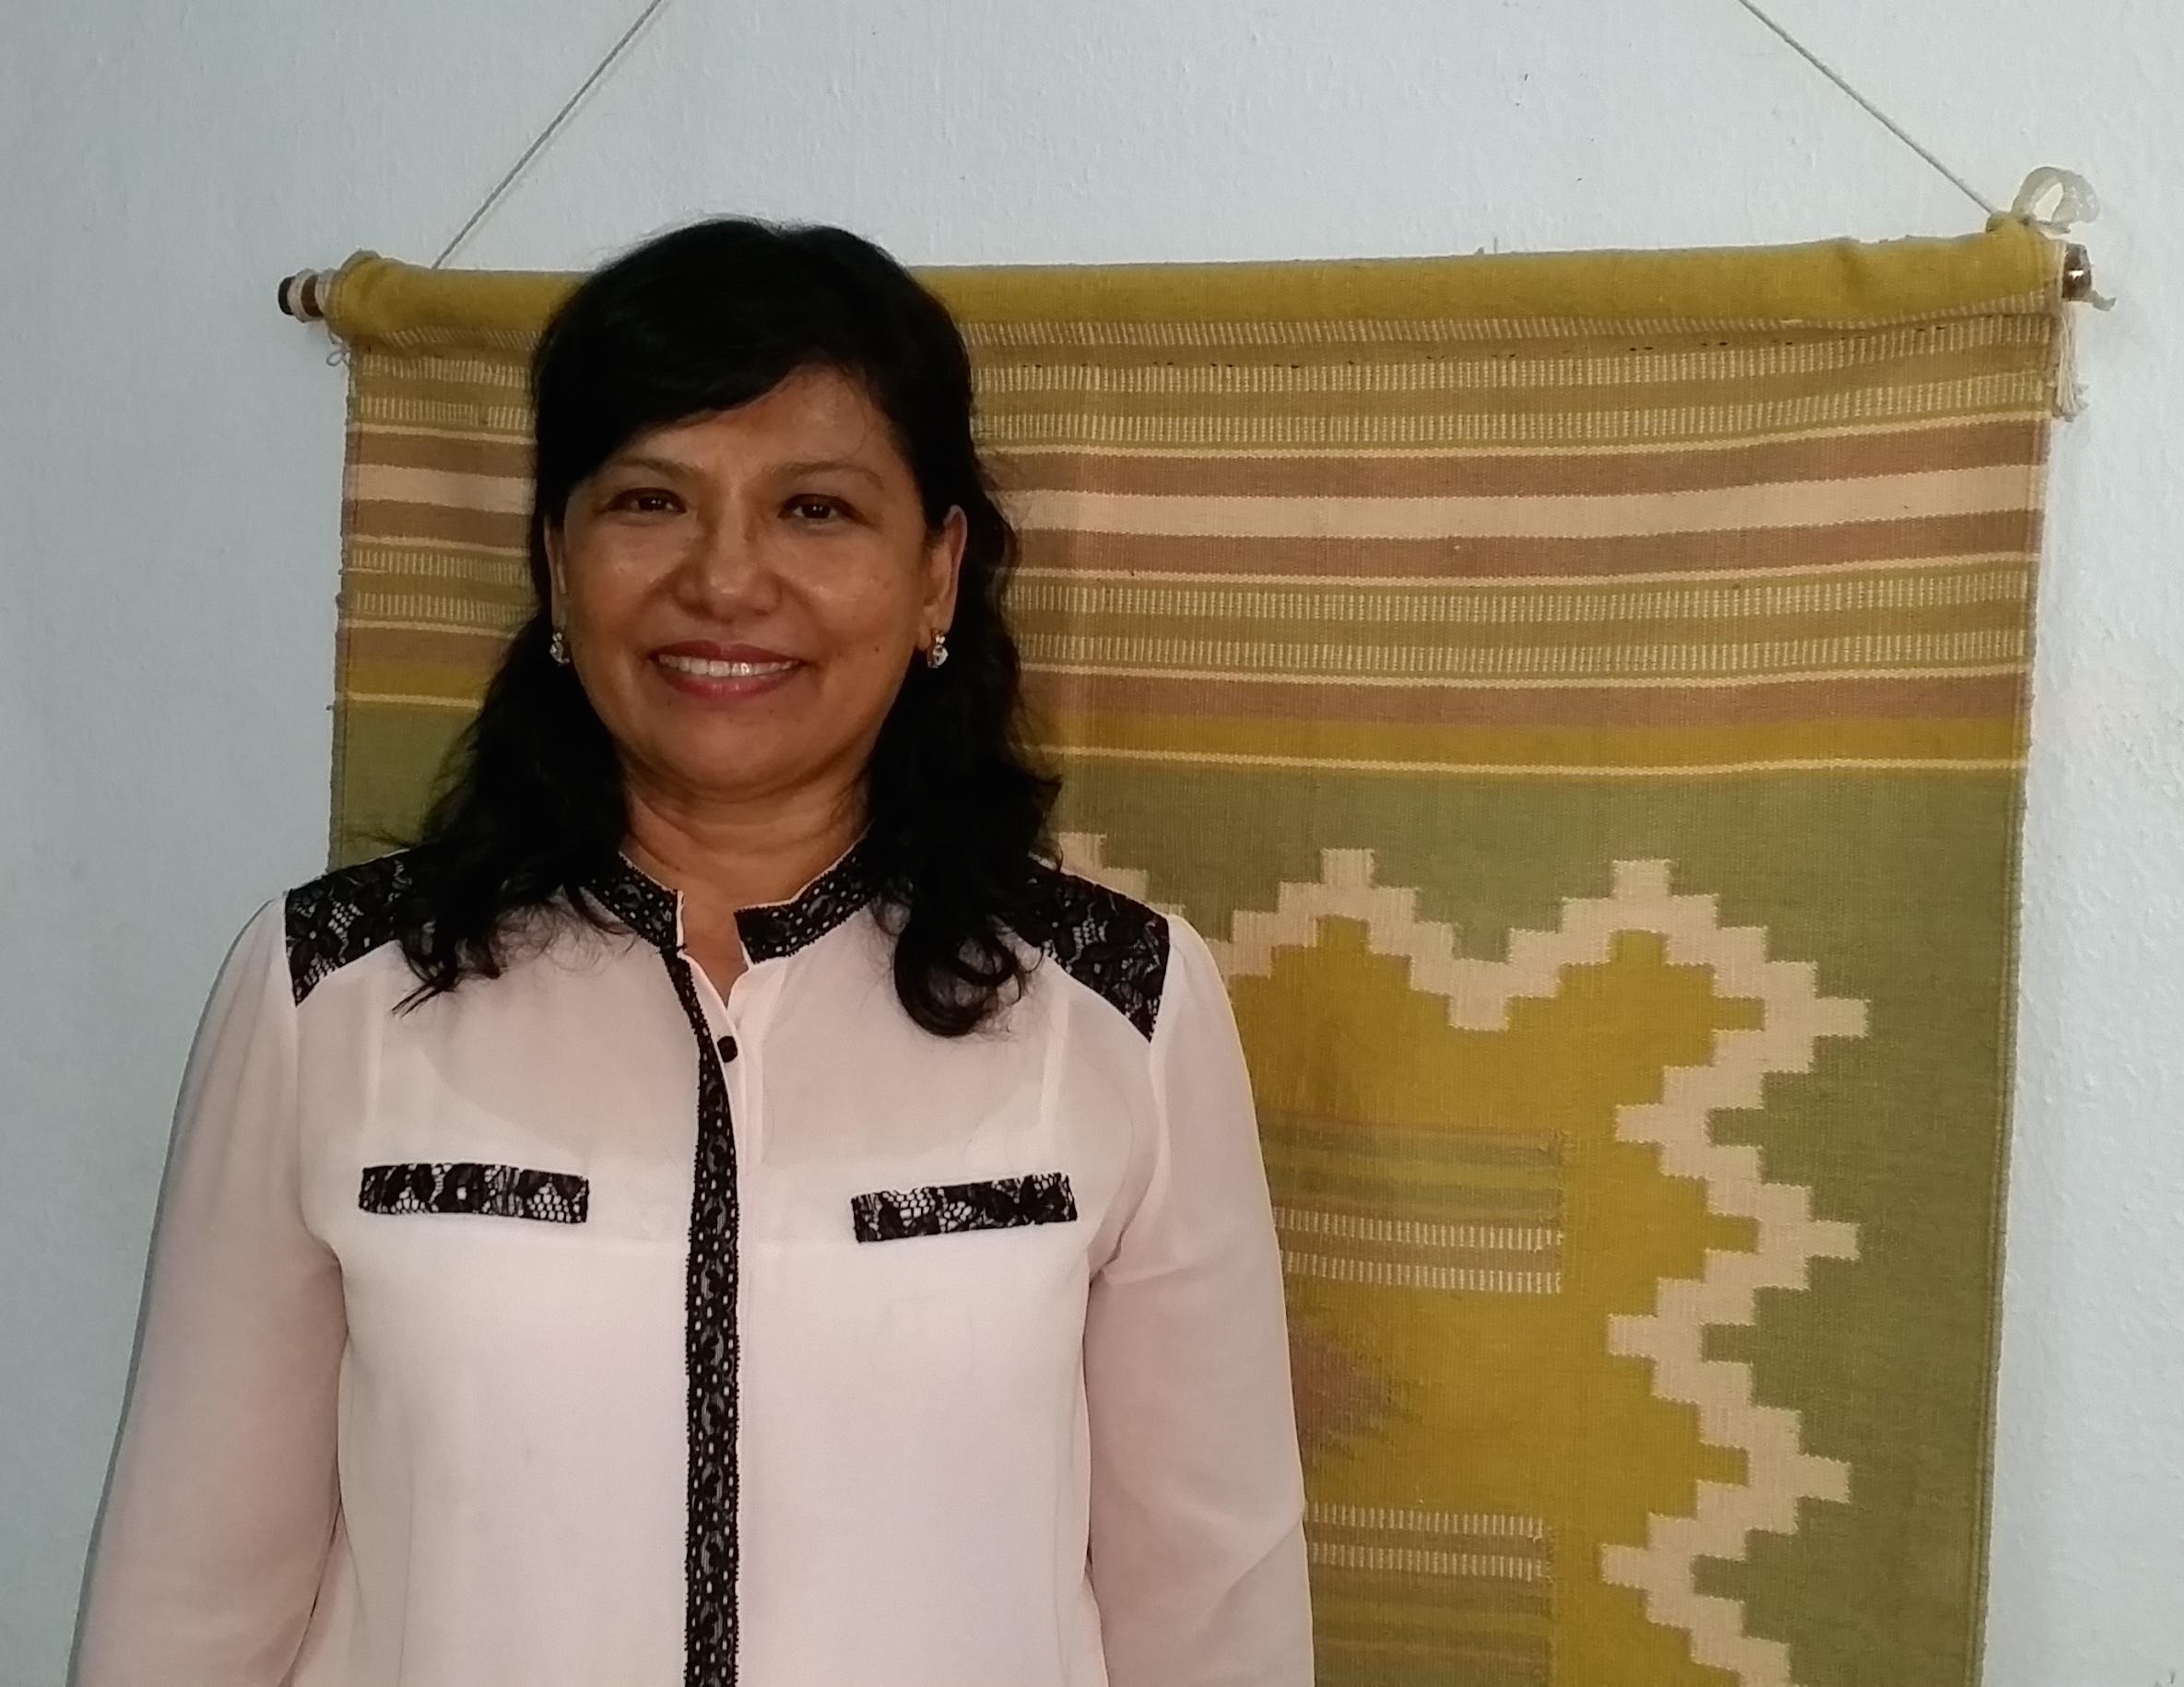 Sarojeni Rengam